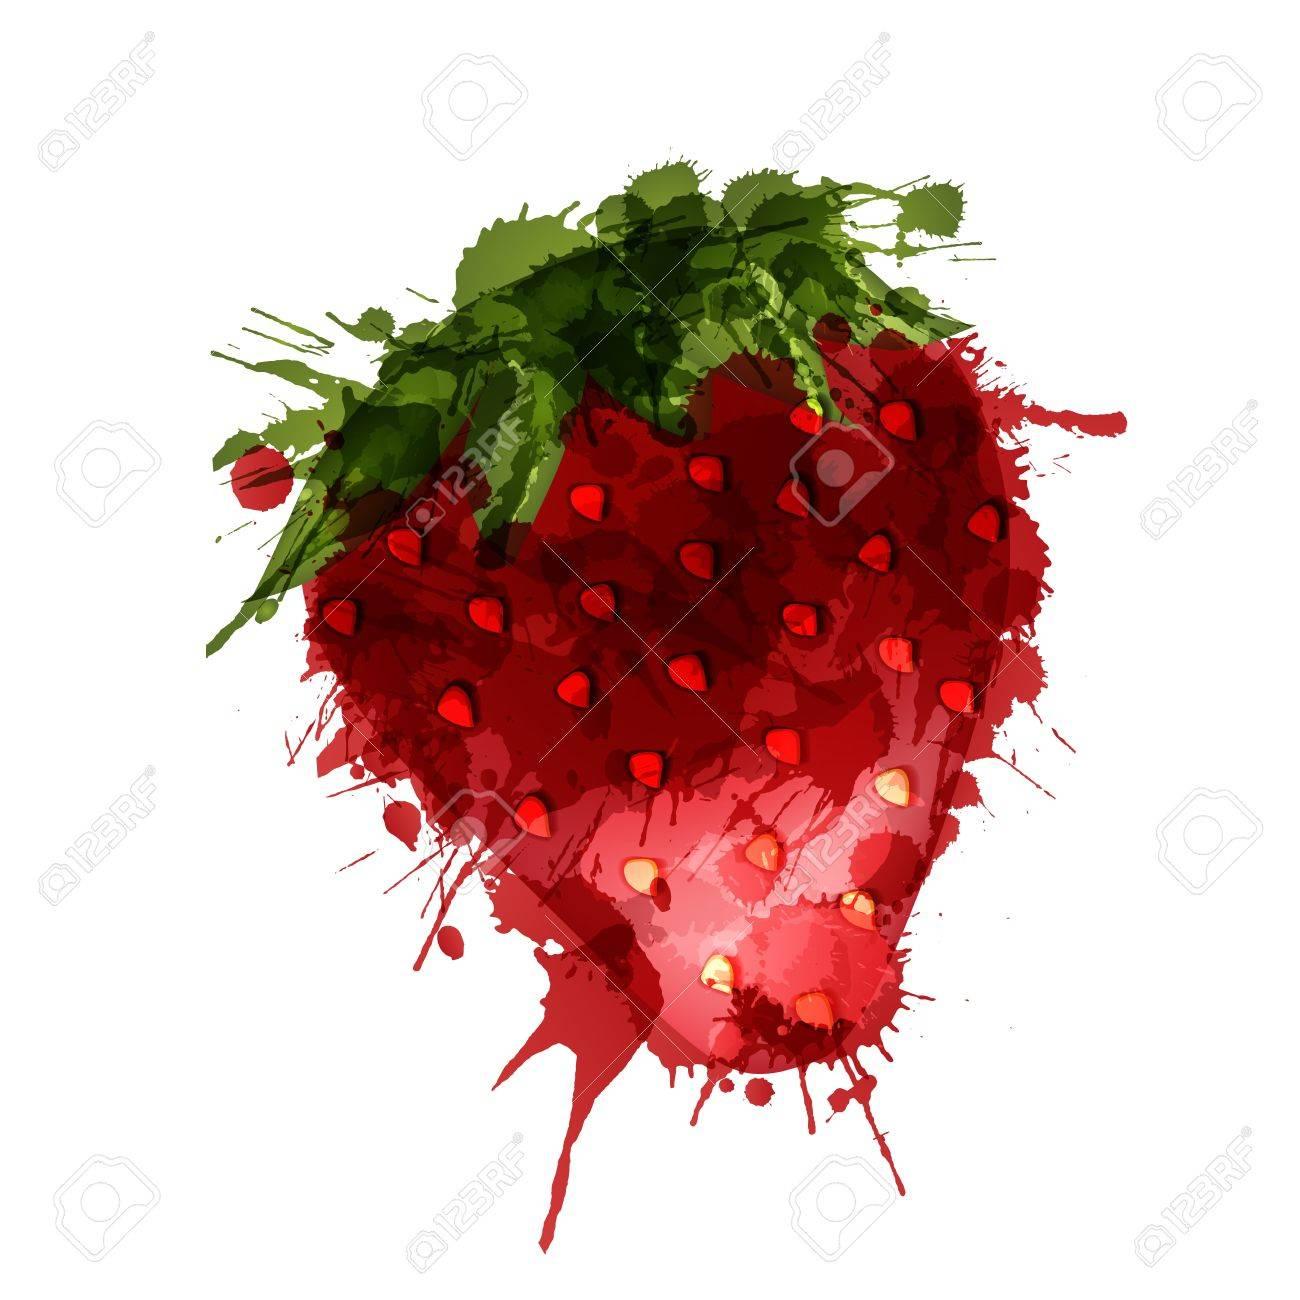 Strawberry made of colorful splashes on white background - 21020298